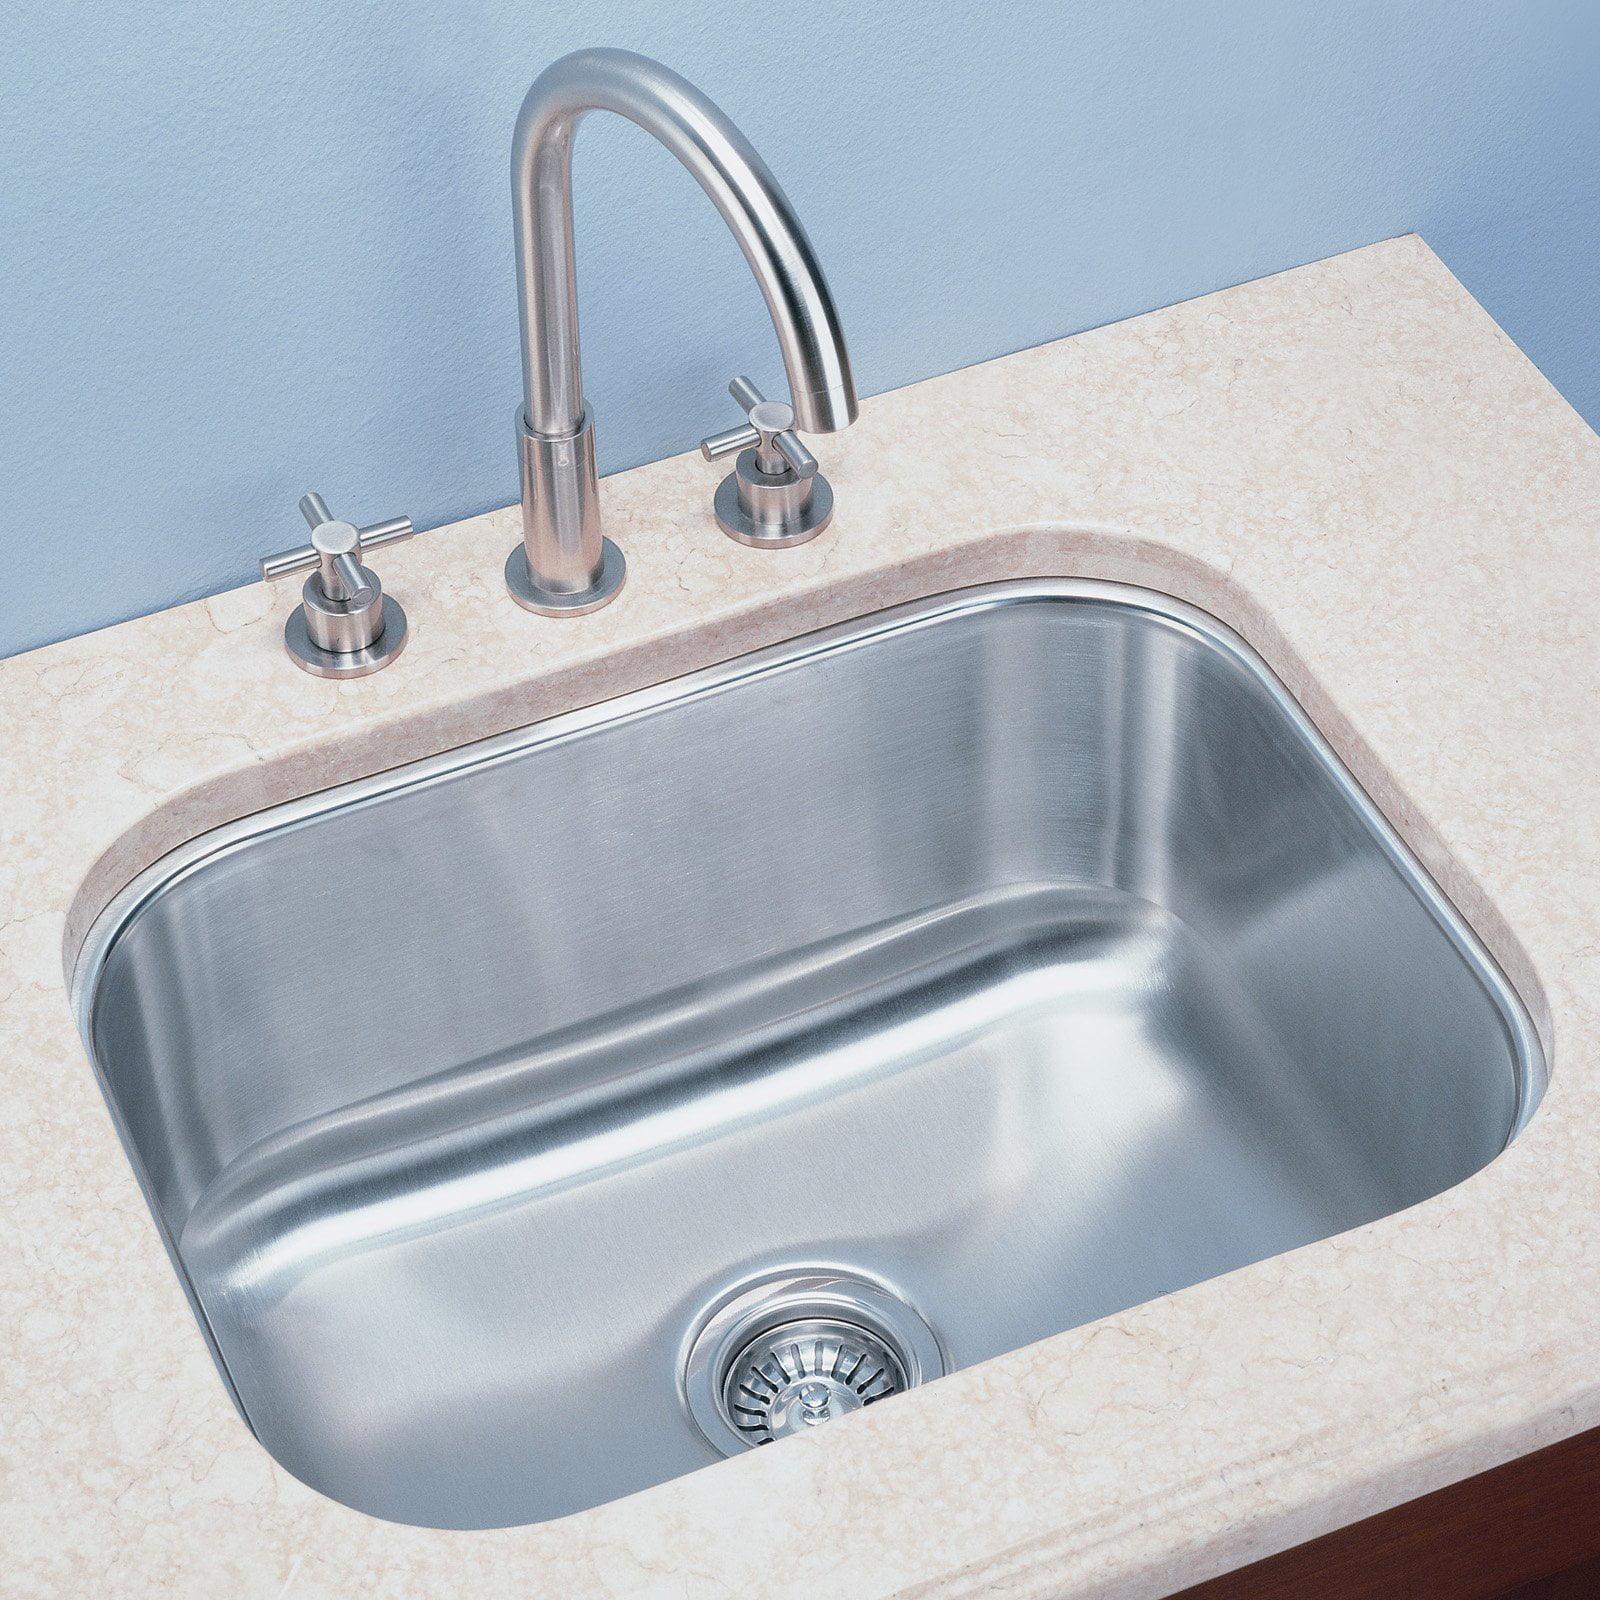 Empire Industries S Single Basin Undermount Kitchen Sink-8 in.